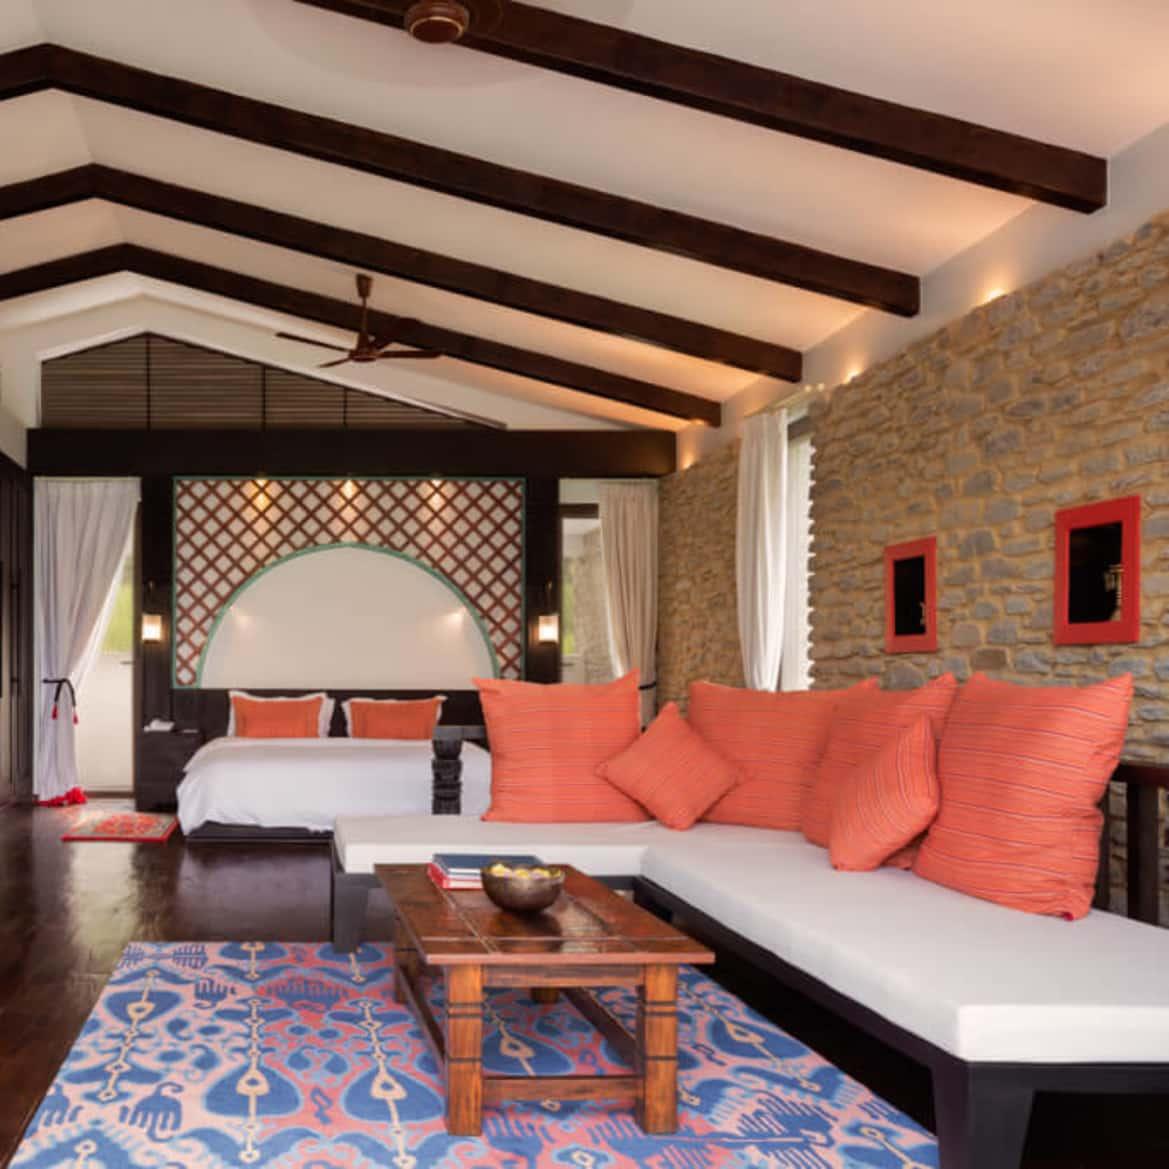 The Pavilions Grand Villa - The Pavilions Himalayas